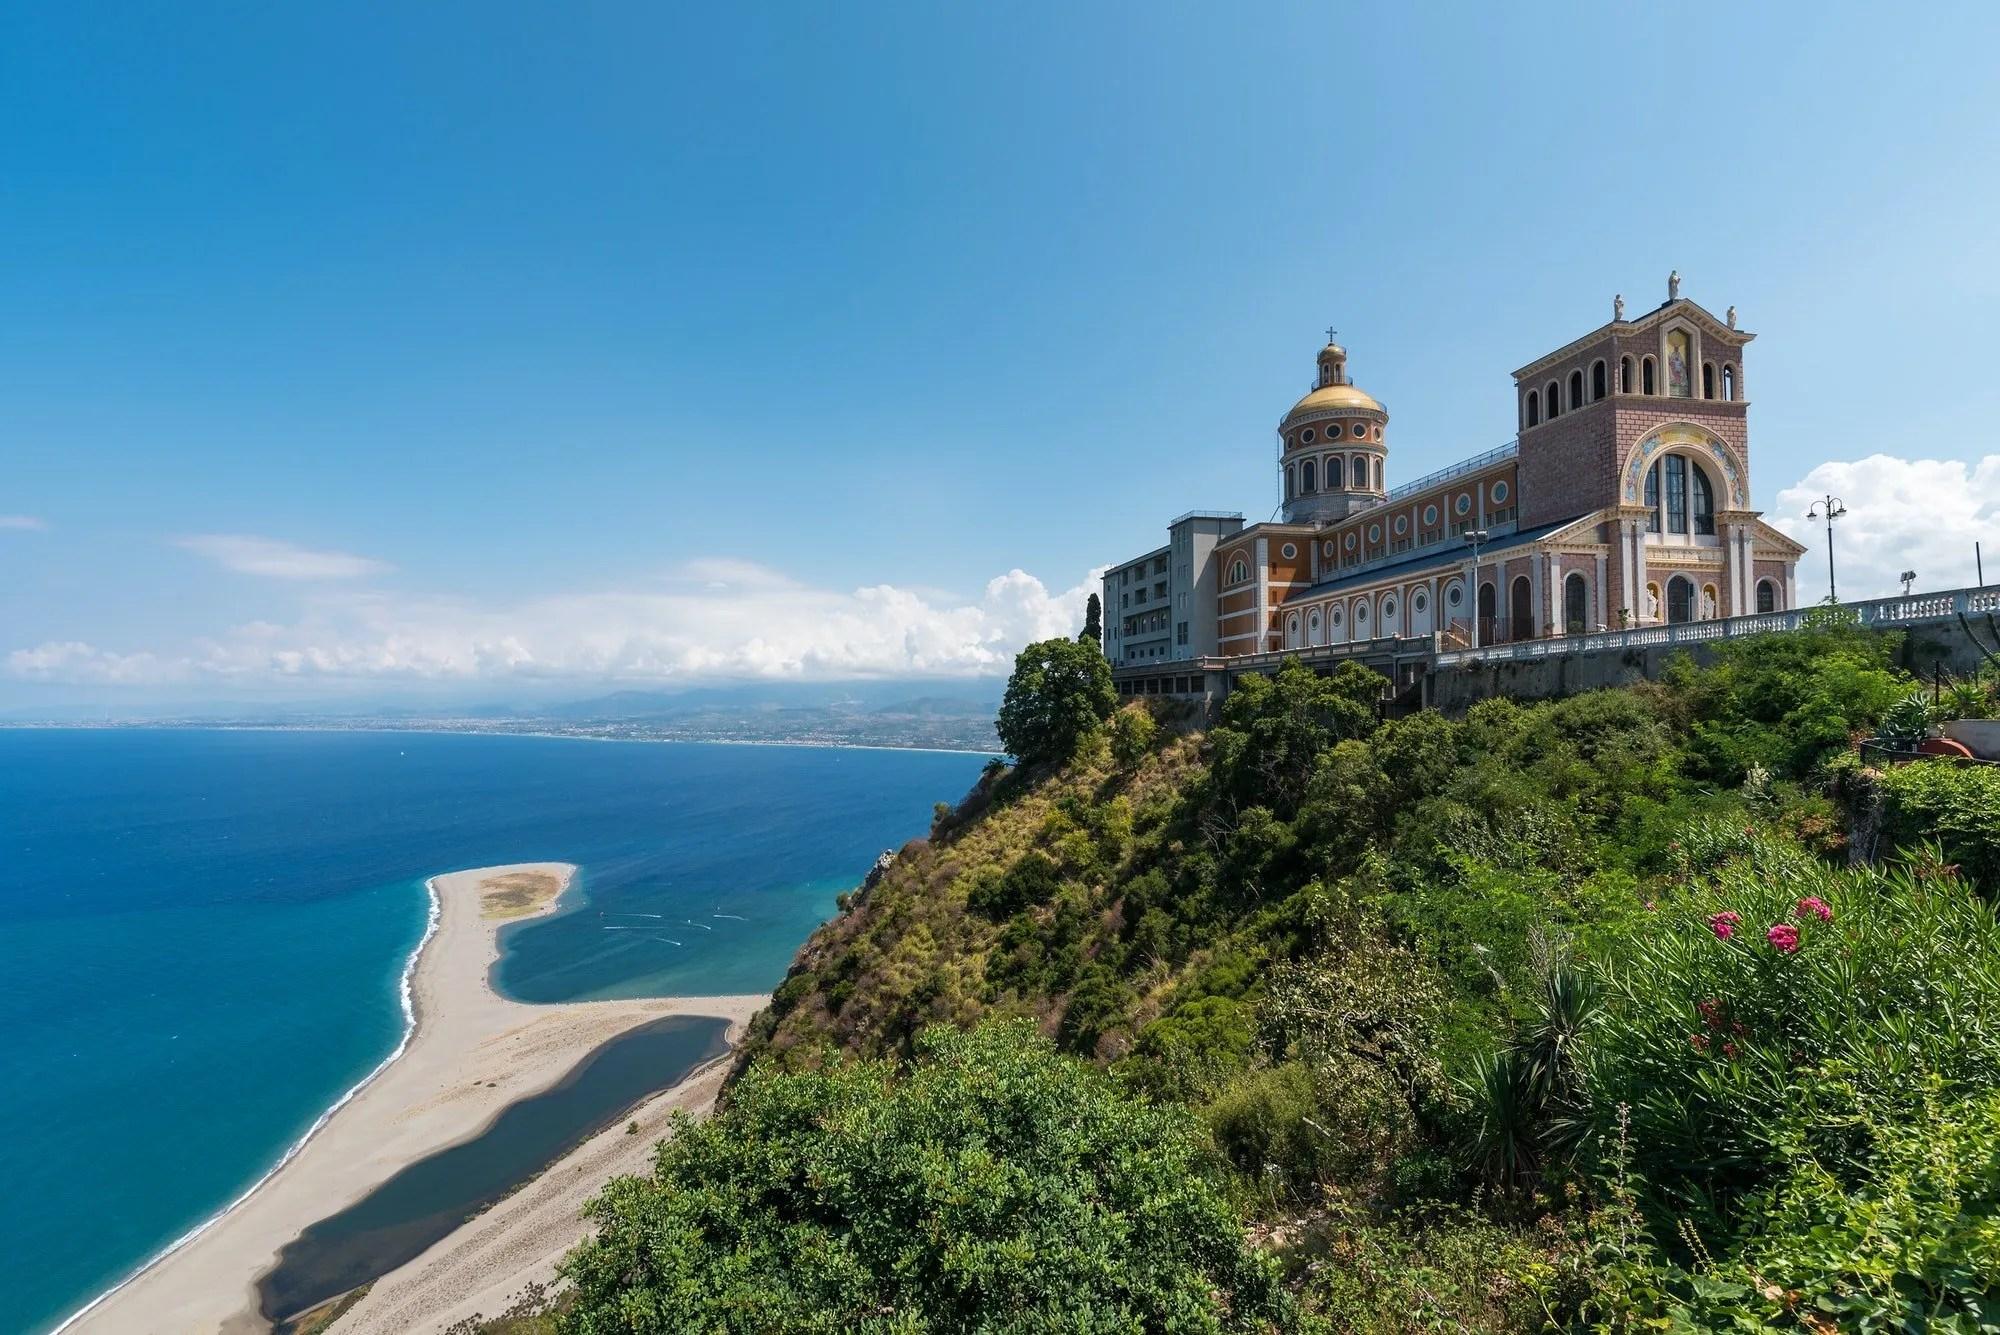 The sanctuary and the beach in Tindari, Sicily